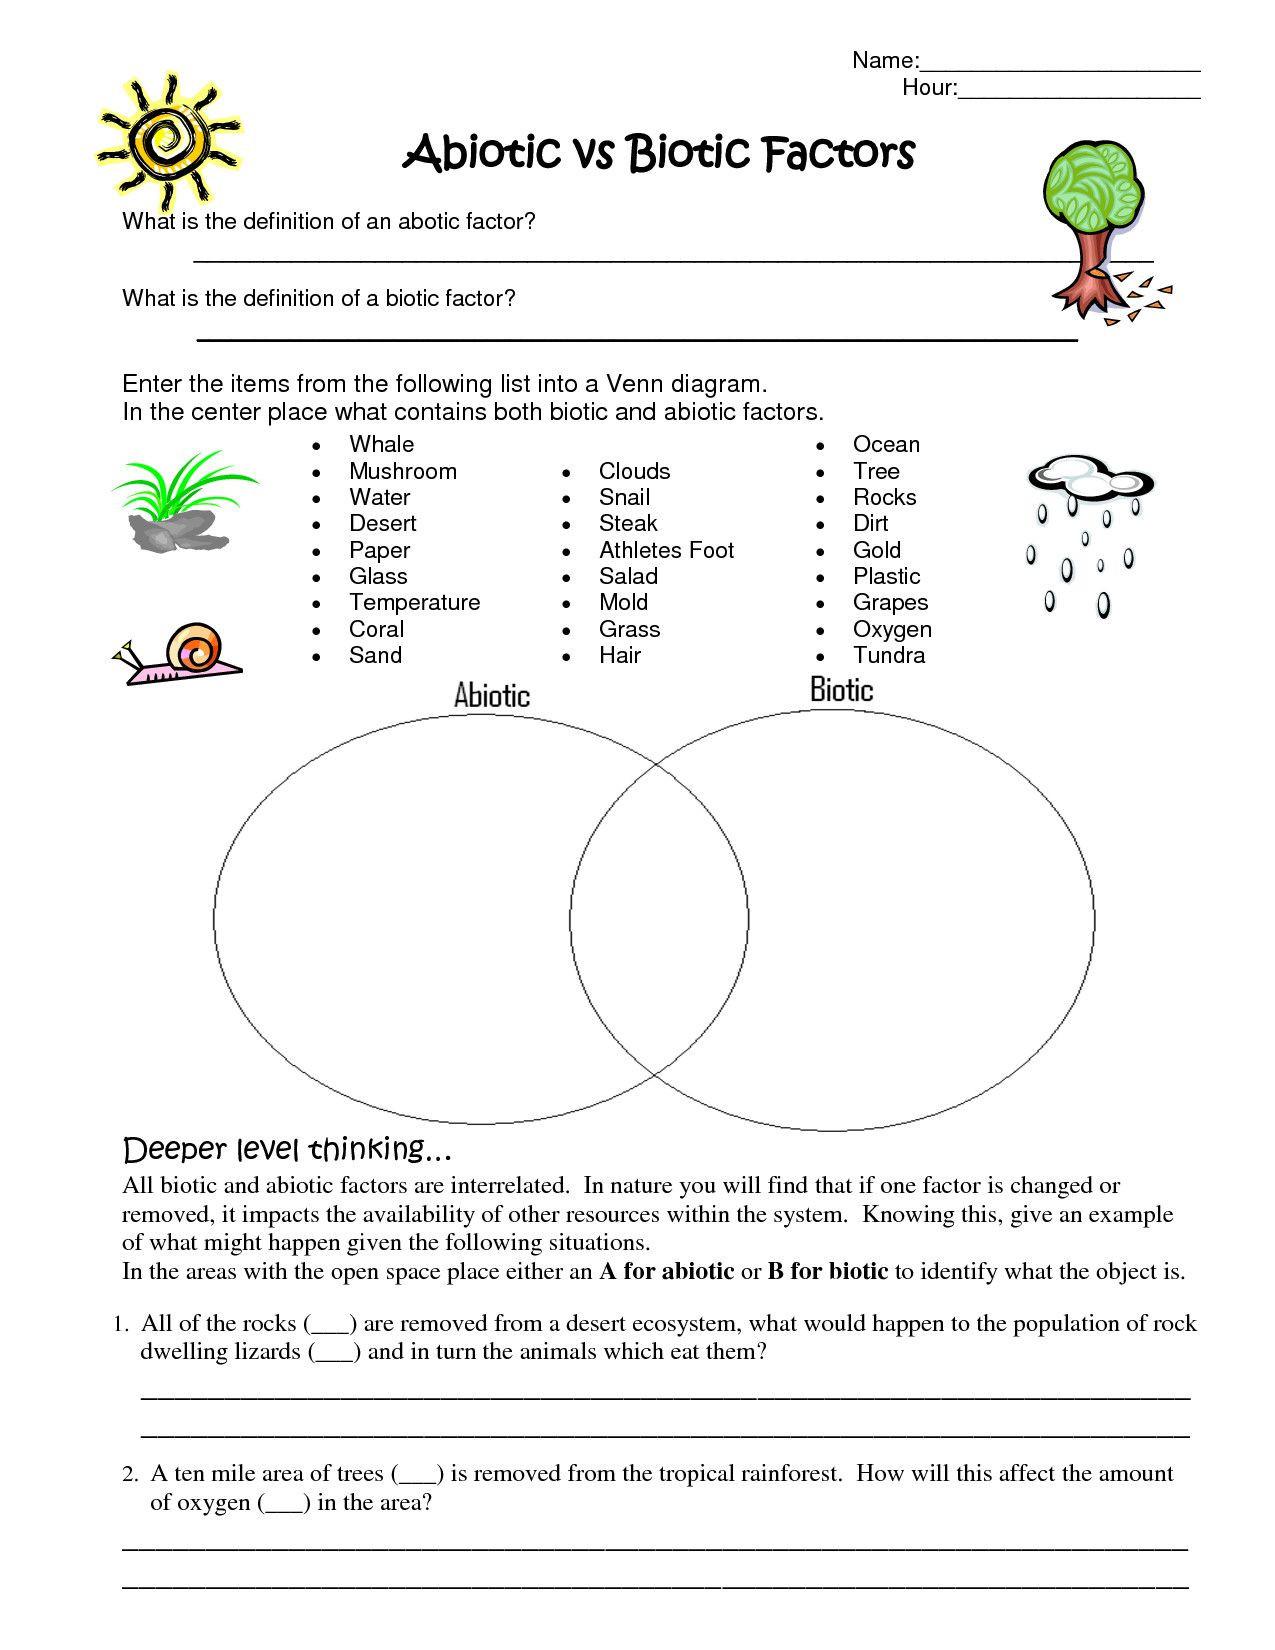 Abiotic and Biotic Factors Worksheet Best Ecosystem Worksheet